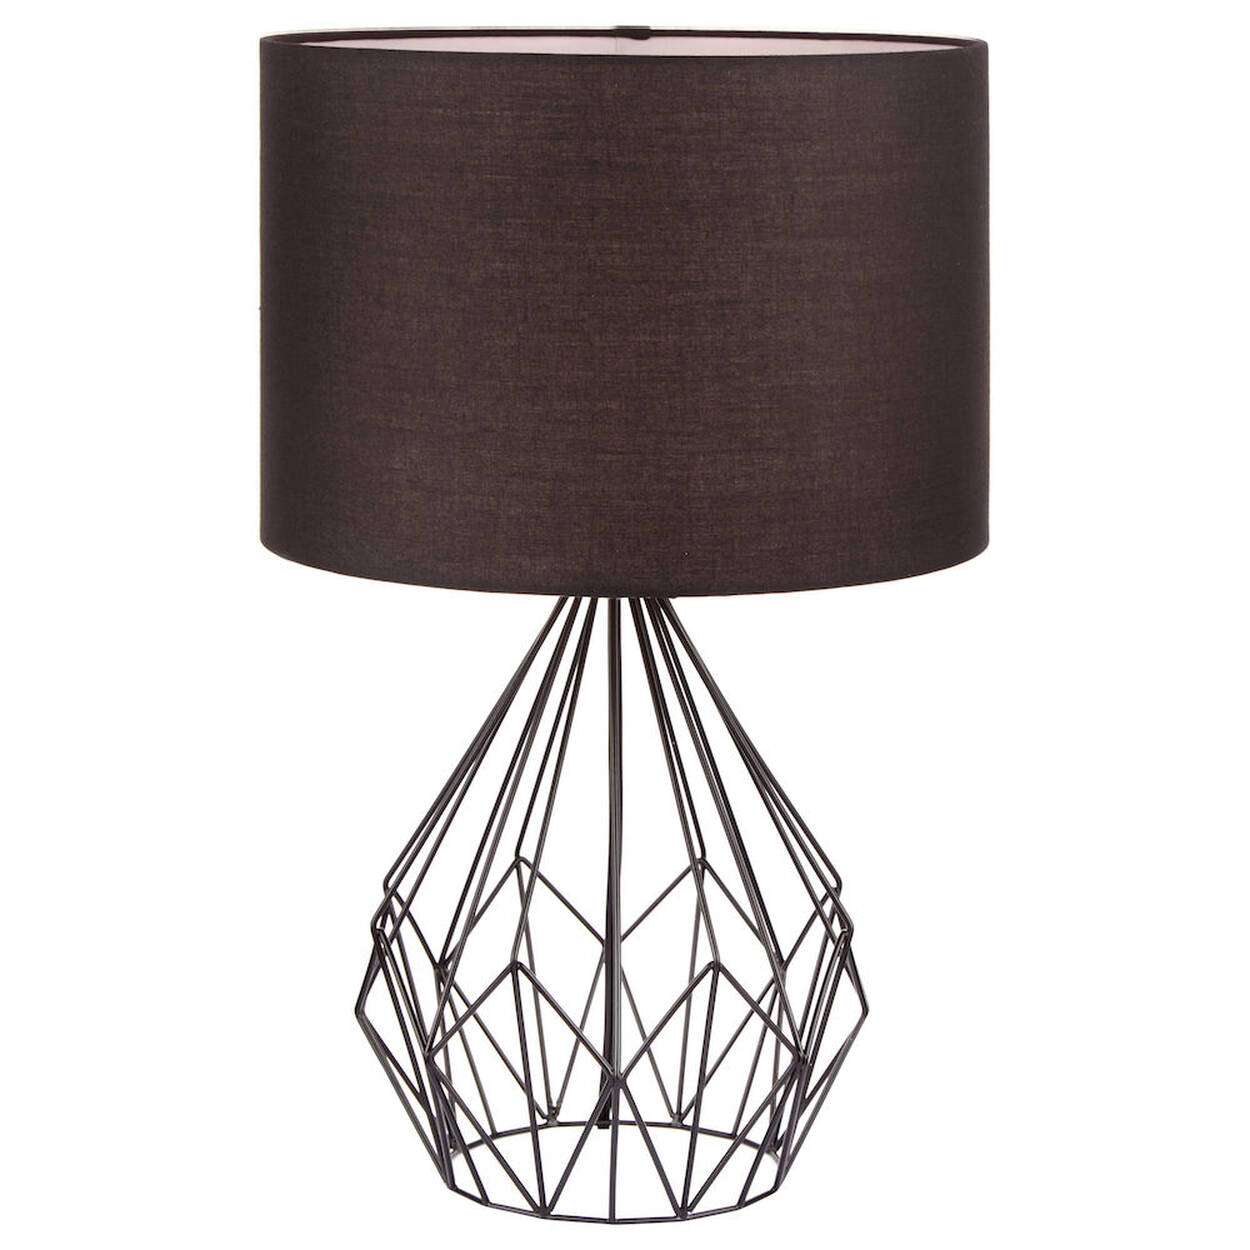 lampe de table en tige de fer en m tal. Black Bedroom Furniture Sets. Home Design Ideas